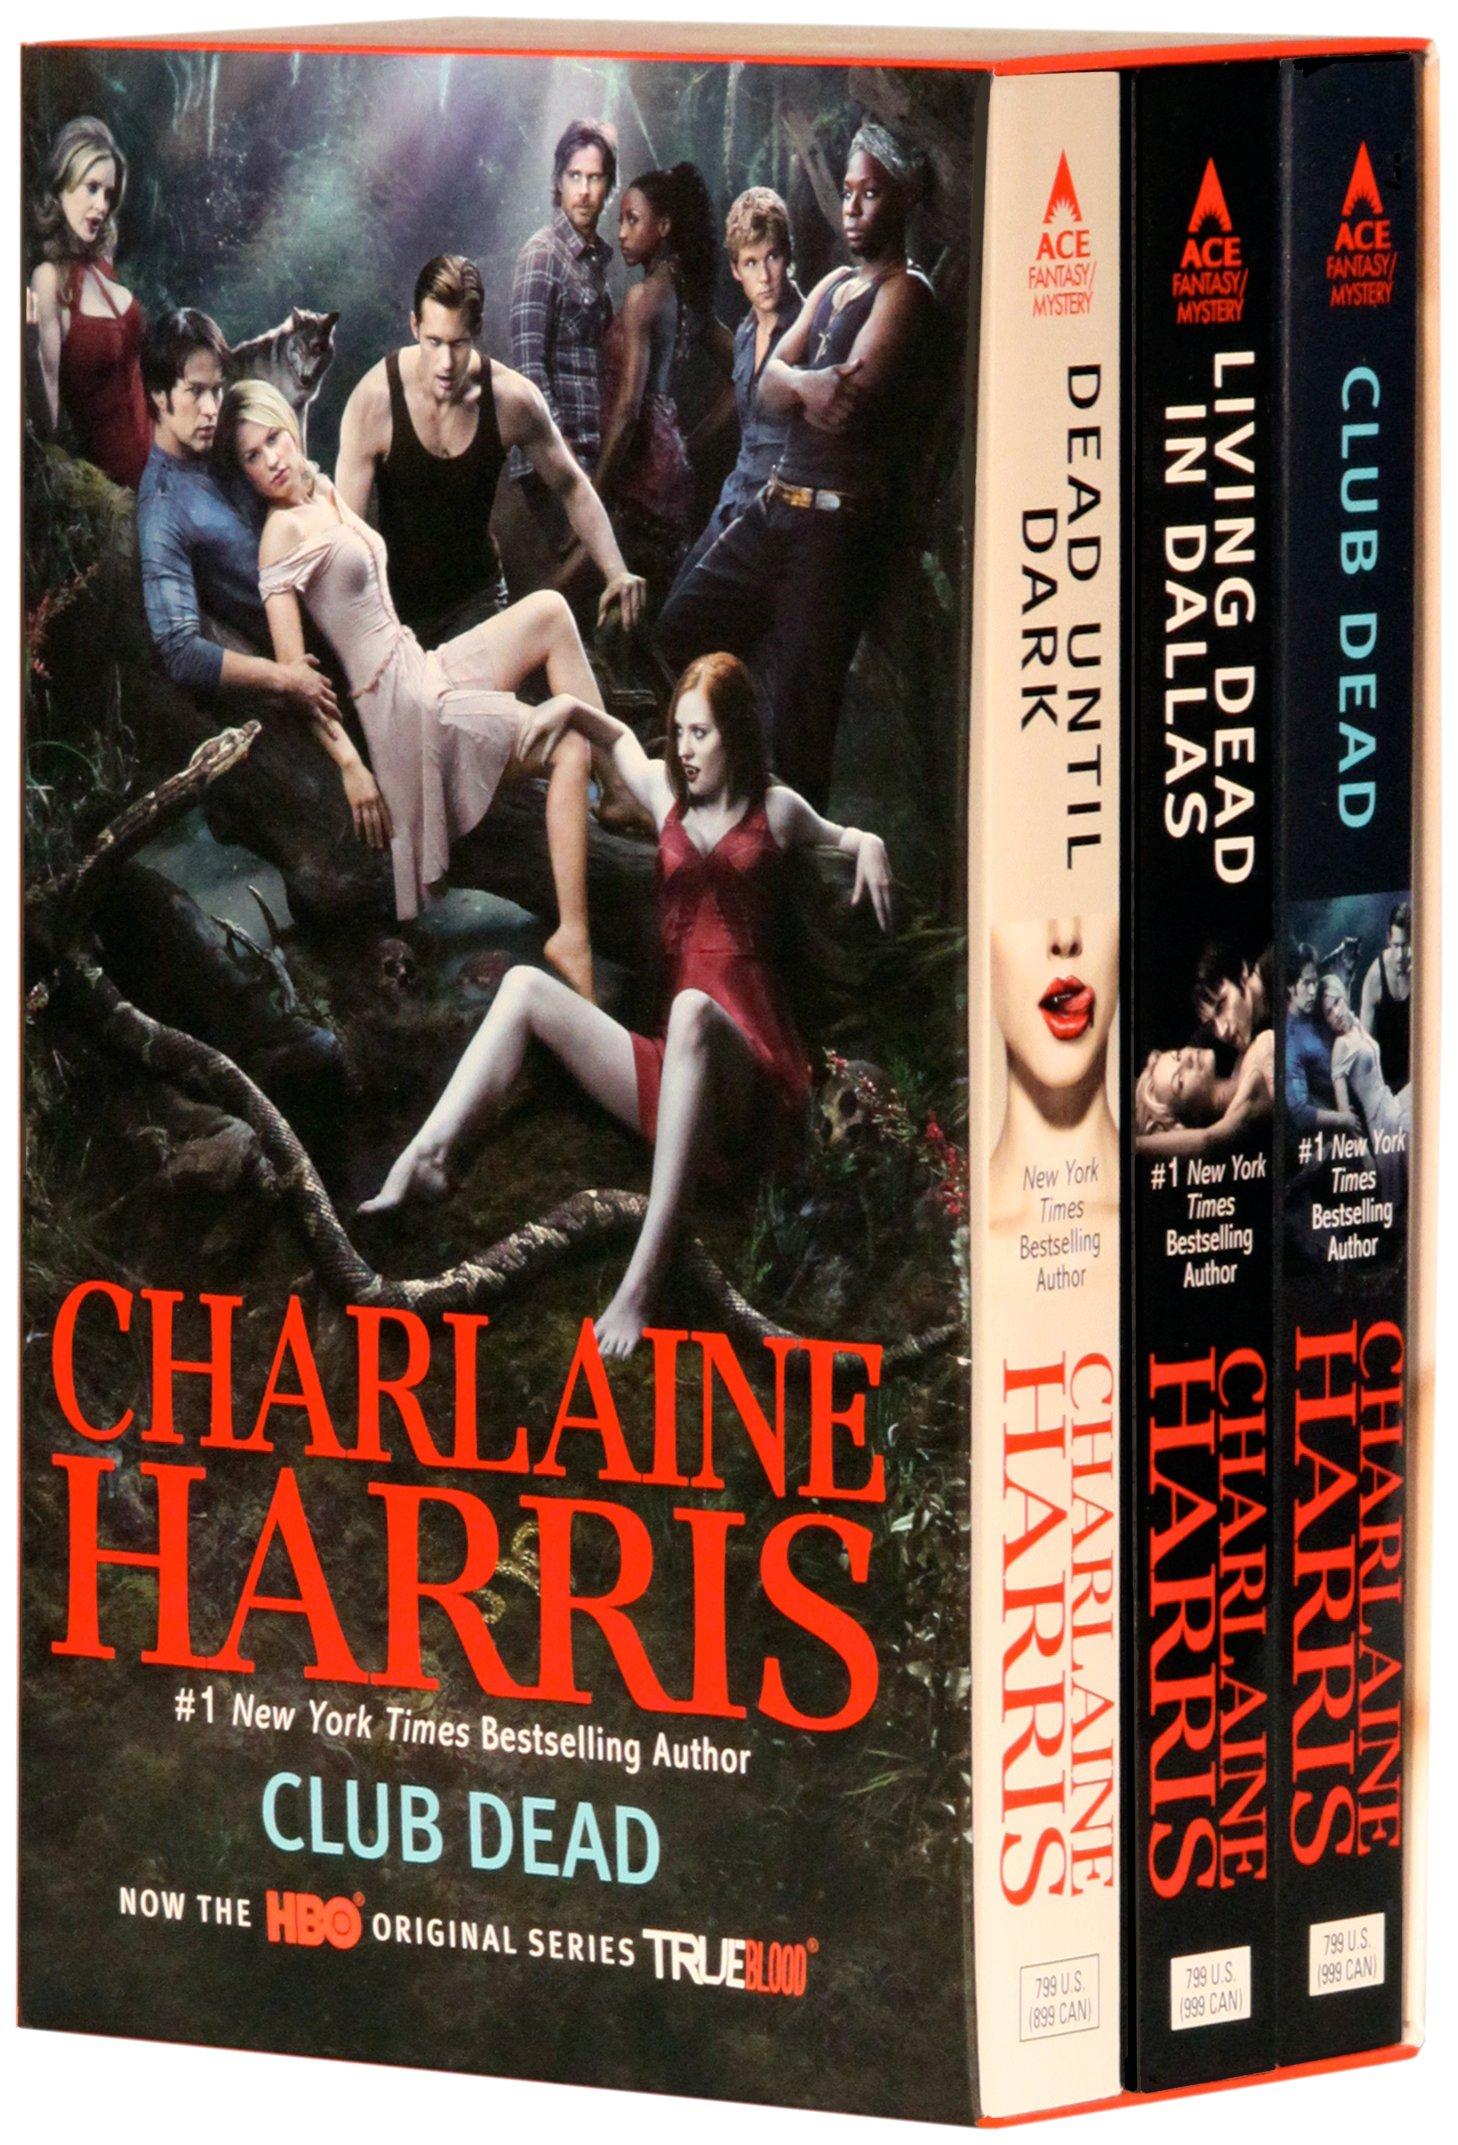 Southern Vampire) (9780441020300): Charlaine Harris: Books